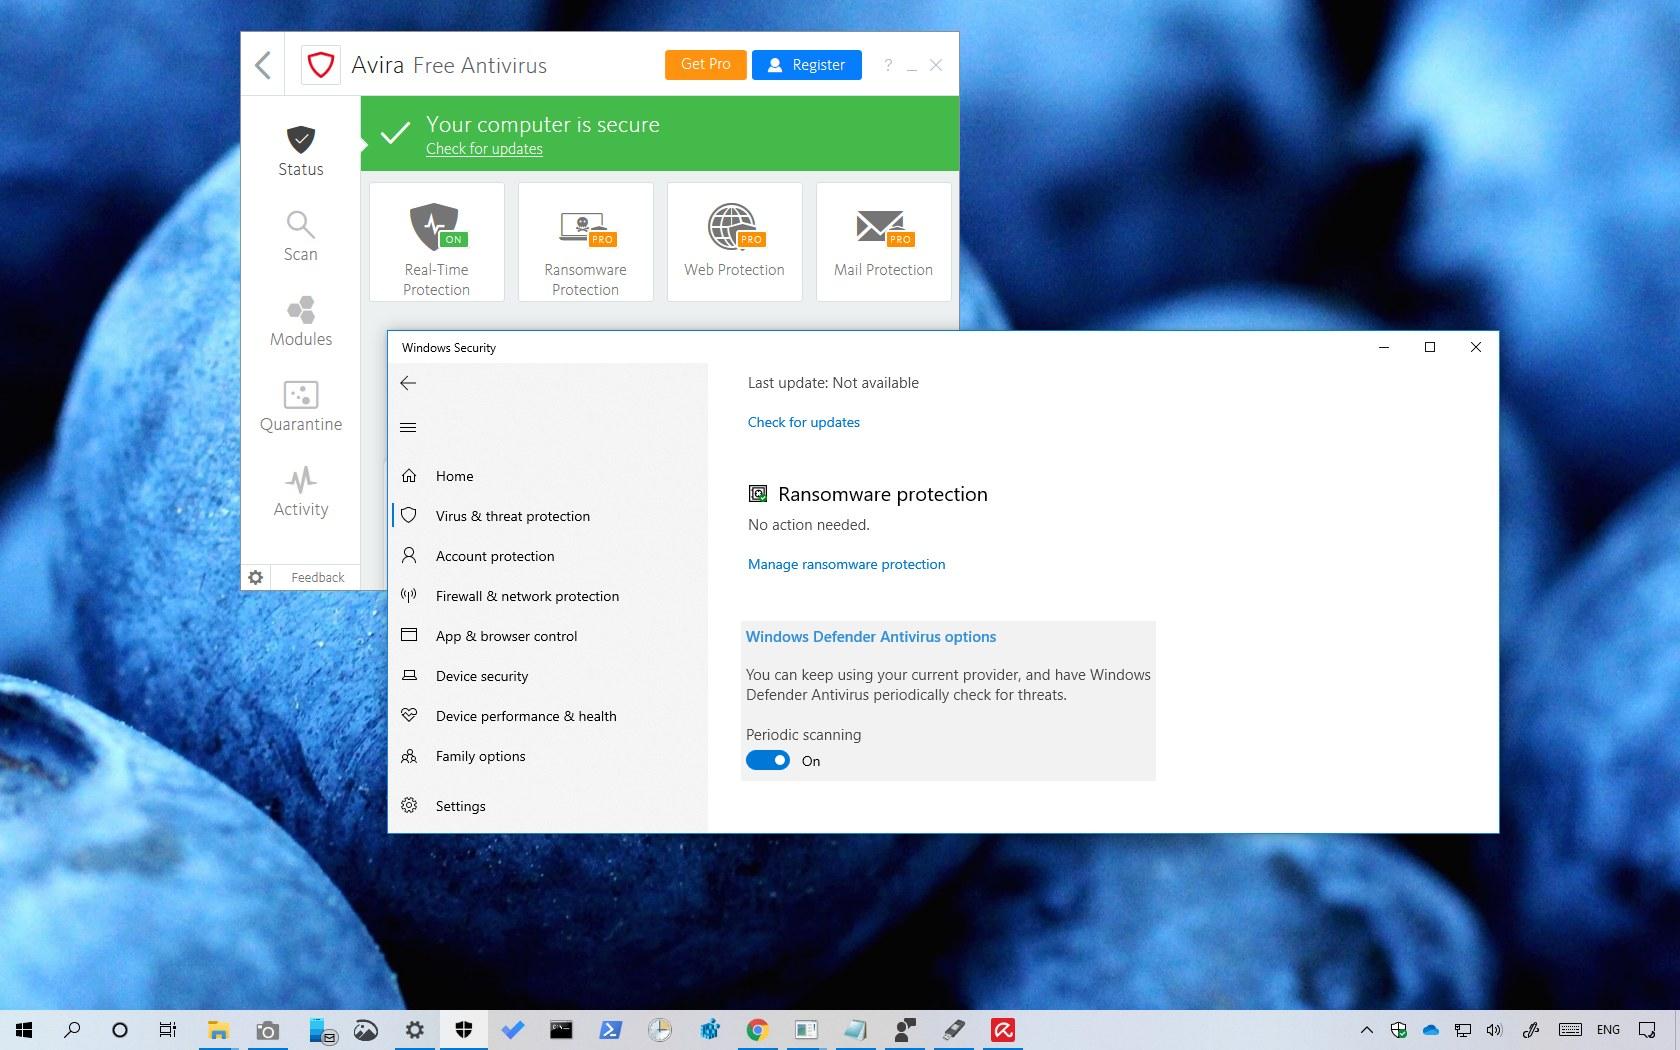 Enabling Windows Defender Antivirus Periodic scanning feature